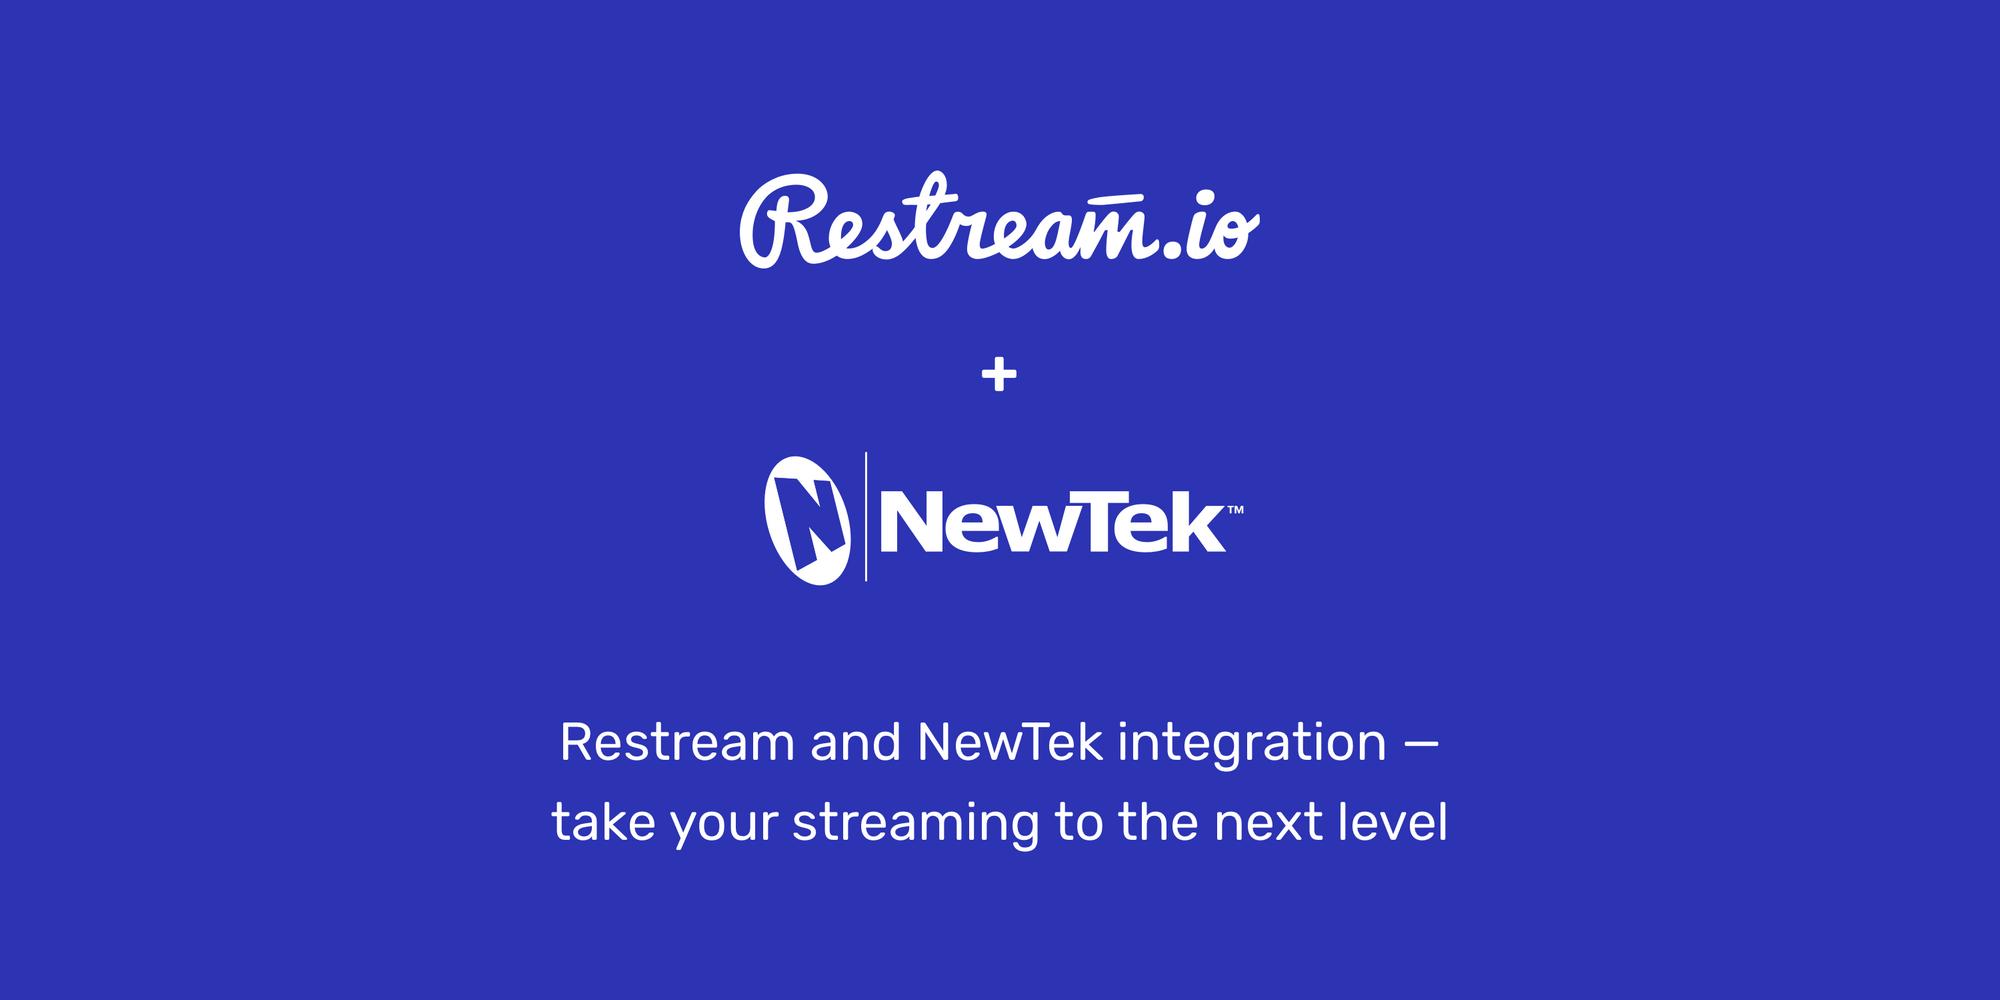 Restream and NewTek integration